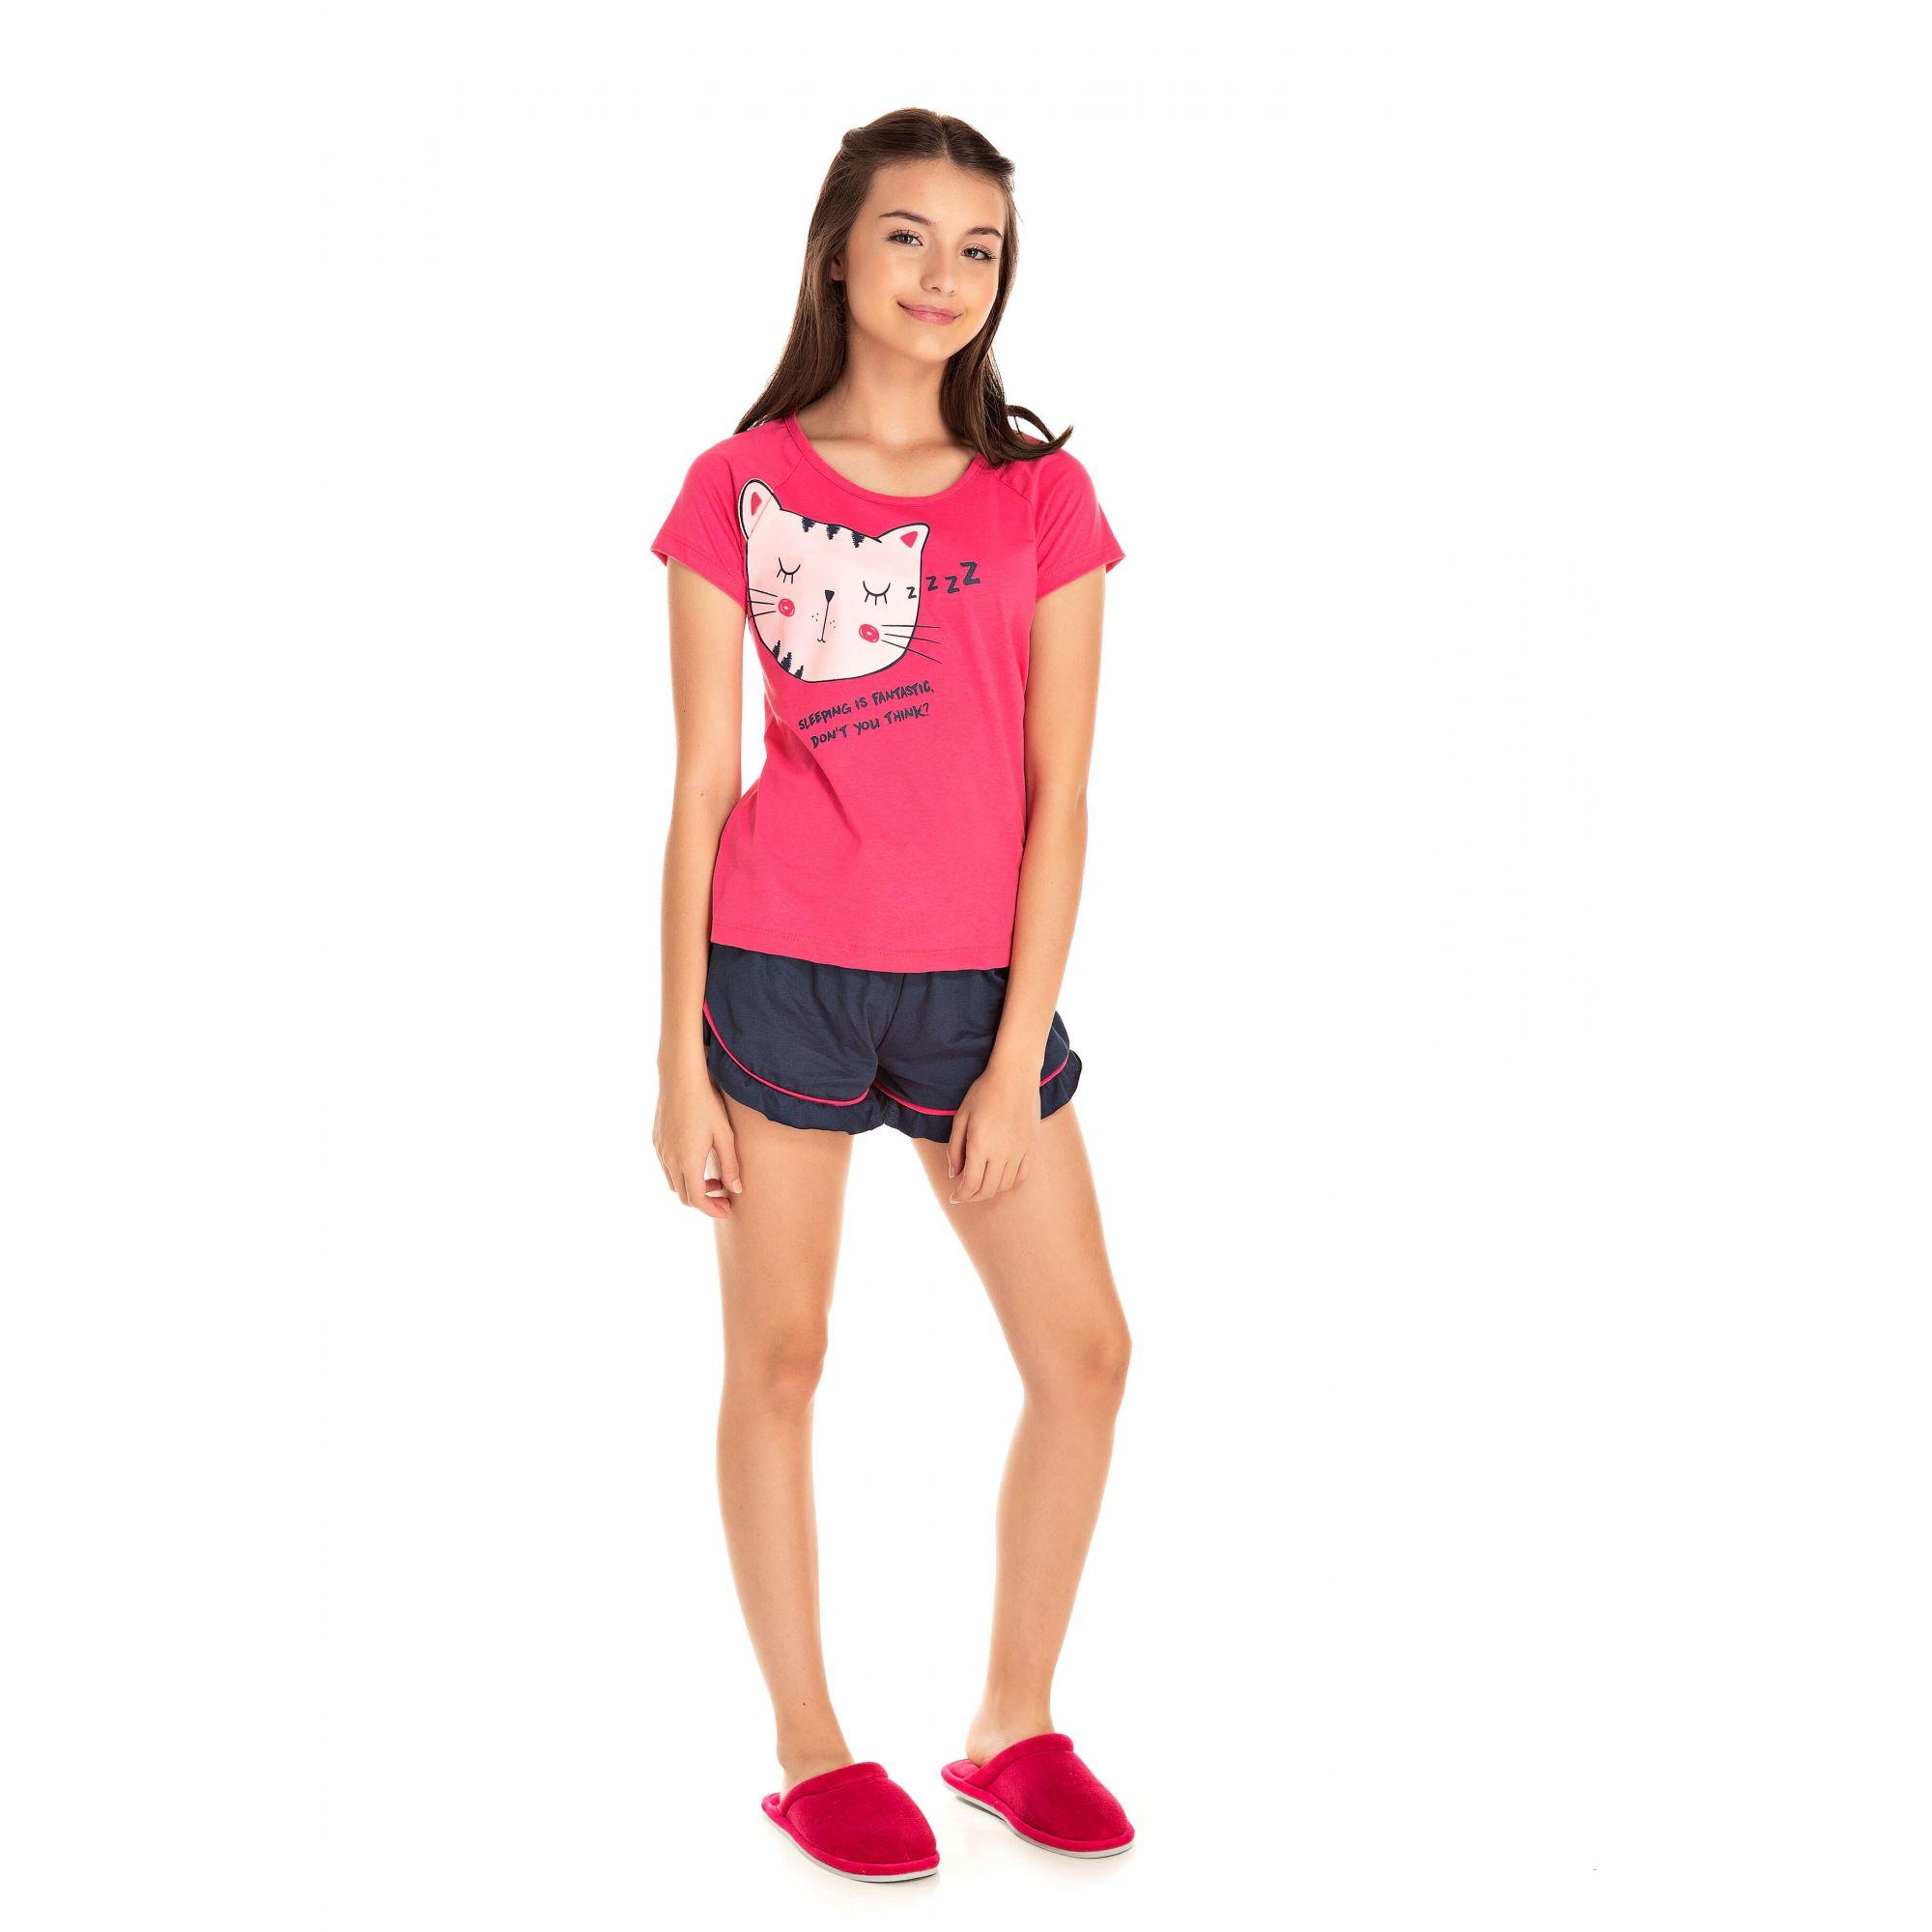 031 - Short Doll Juvenil Feminino Gatinho Zzz - Pink